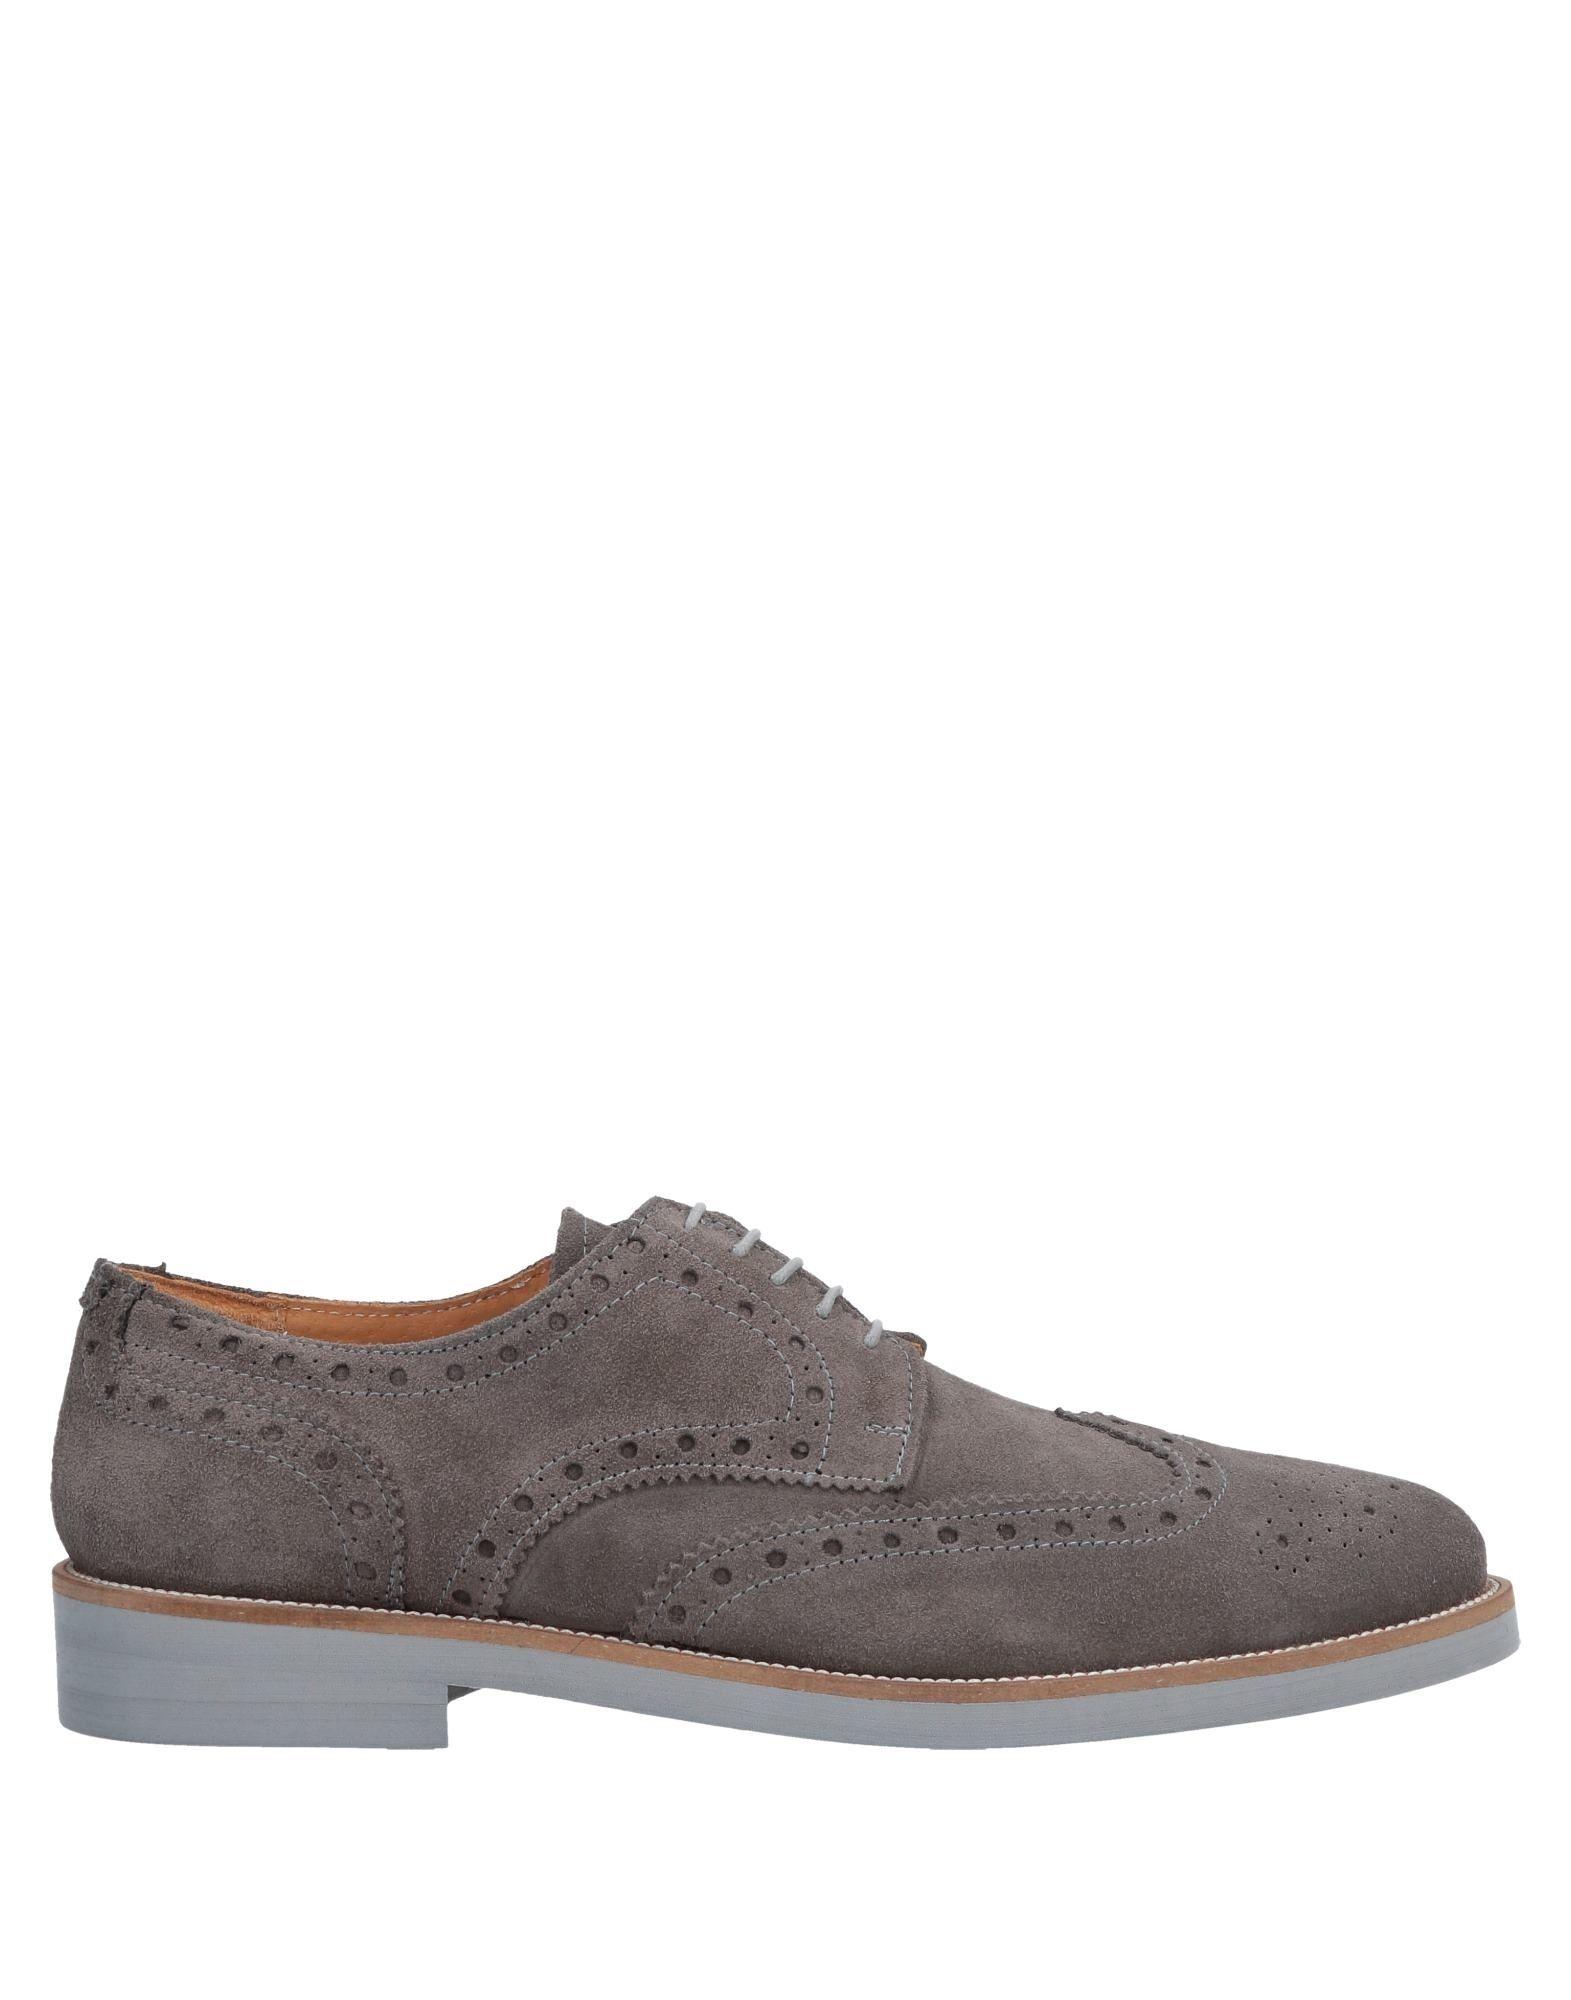 PAOLO DA PONTE Обувь на шнурках paolo da ponte ремень